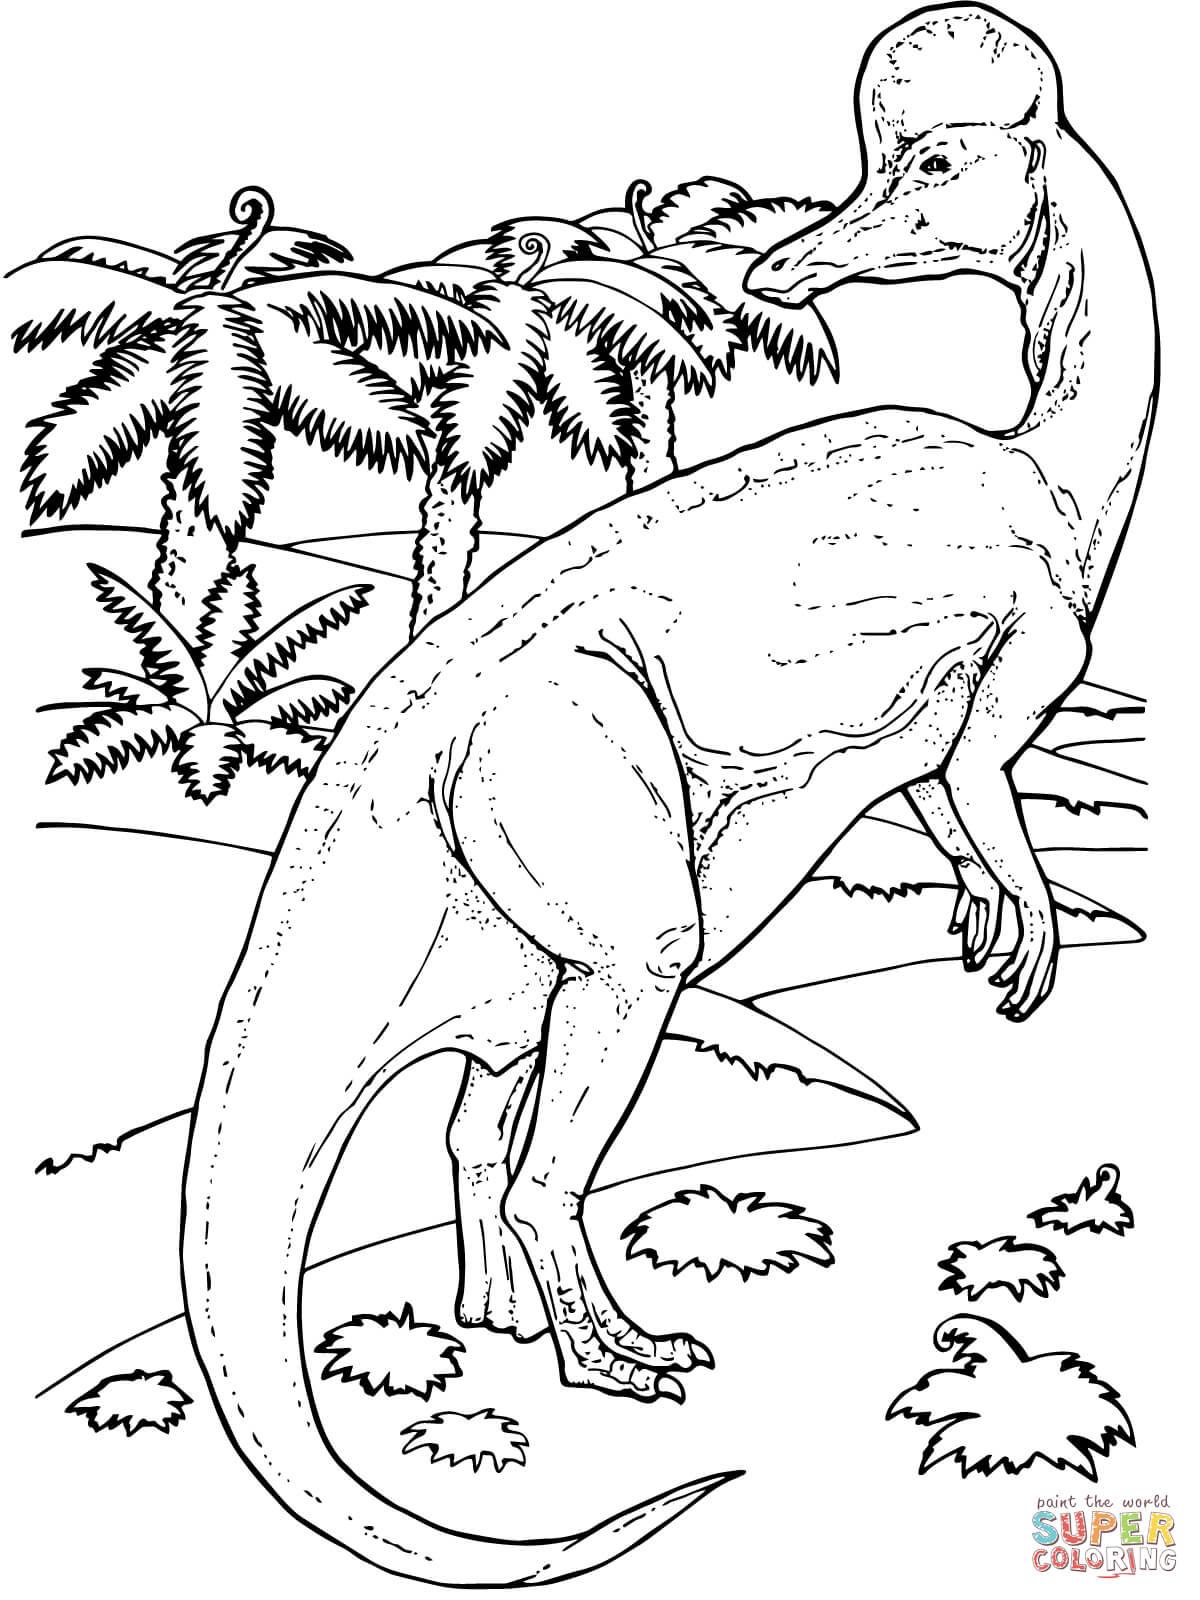 Corythosaurus Duck Billed Dinosaur Coloring Page